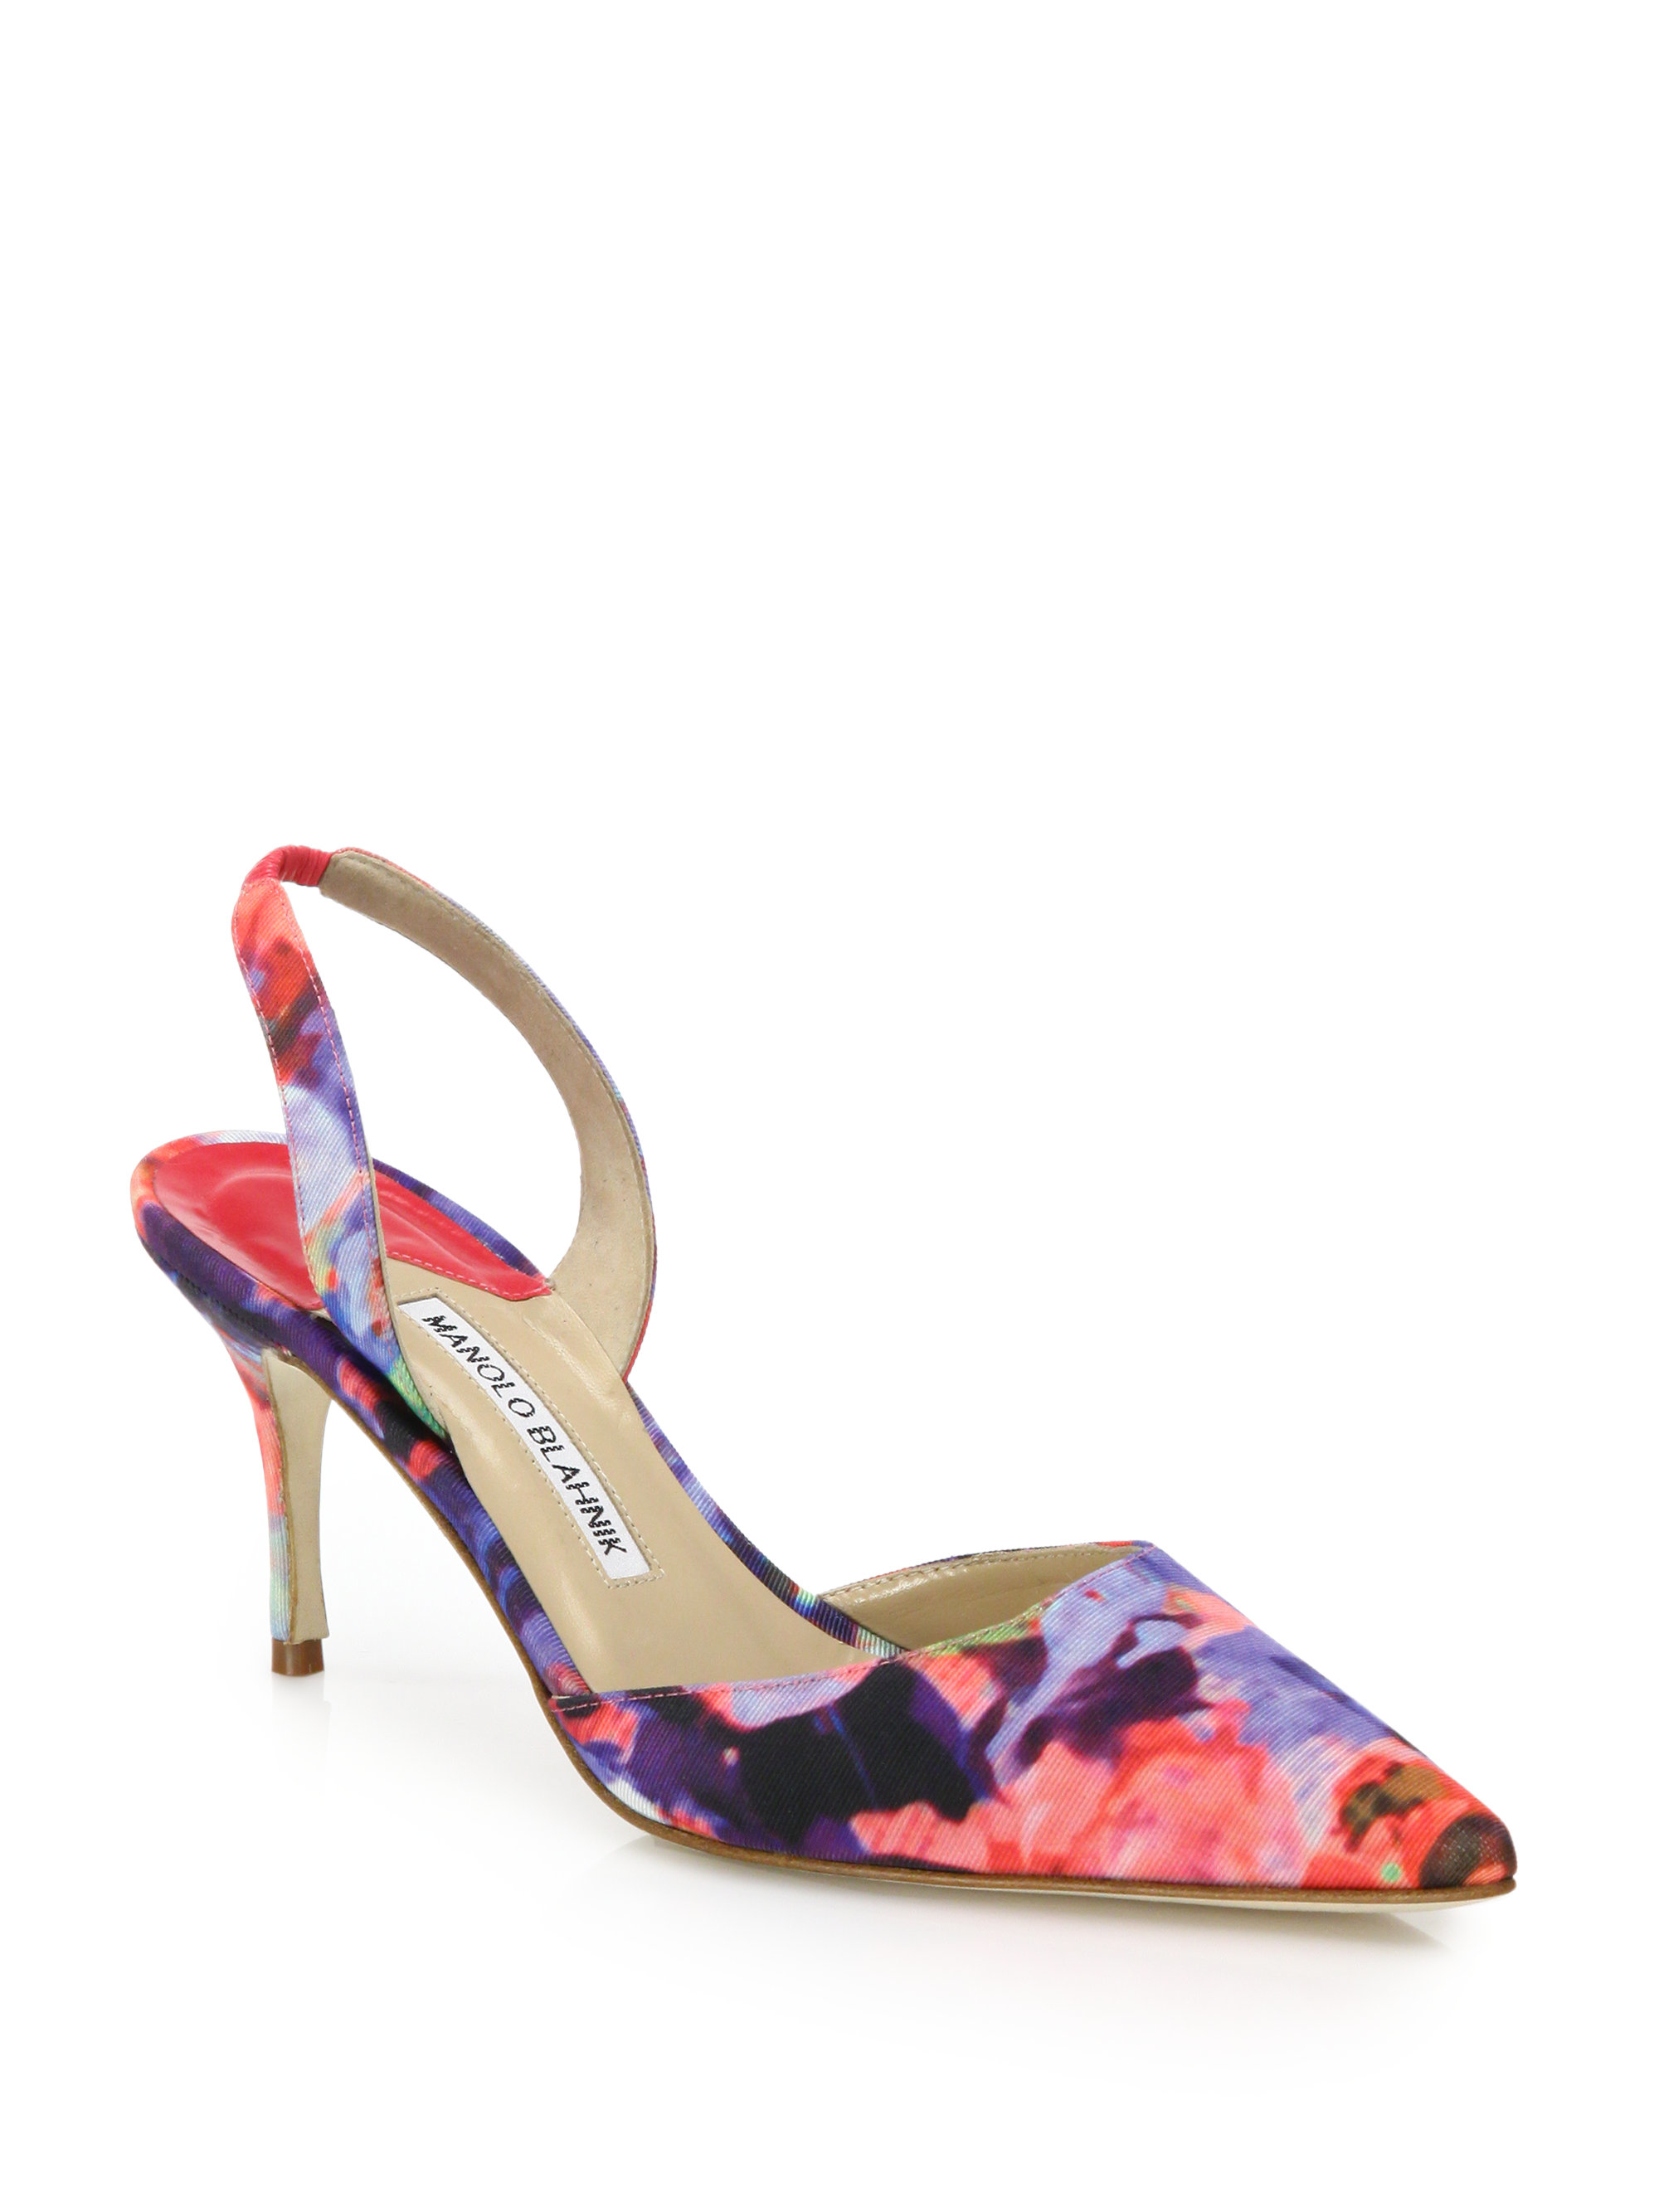 Lyst Manolo Blahnik Carolyne Floral Textile Mid Heel